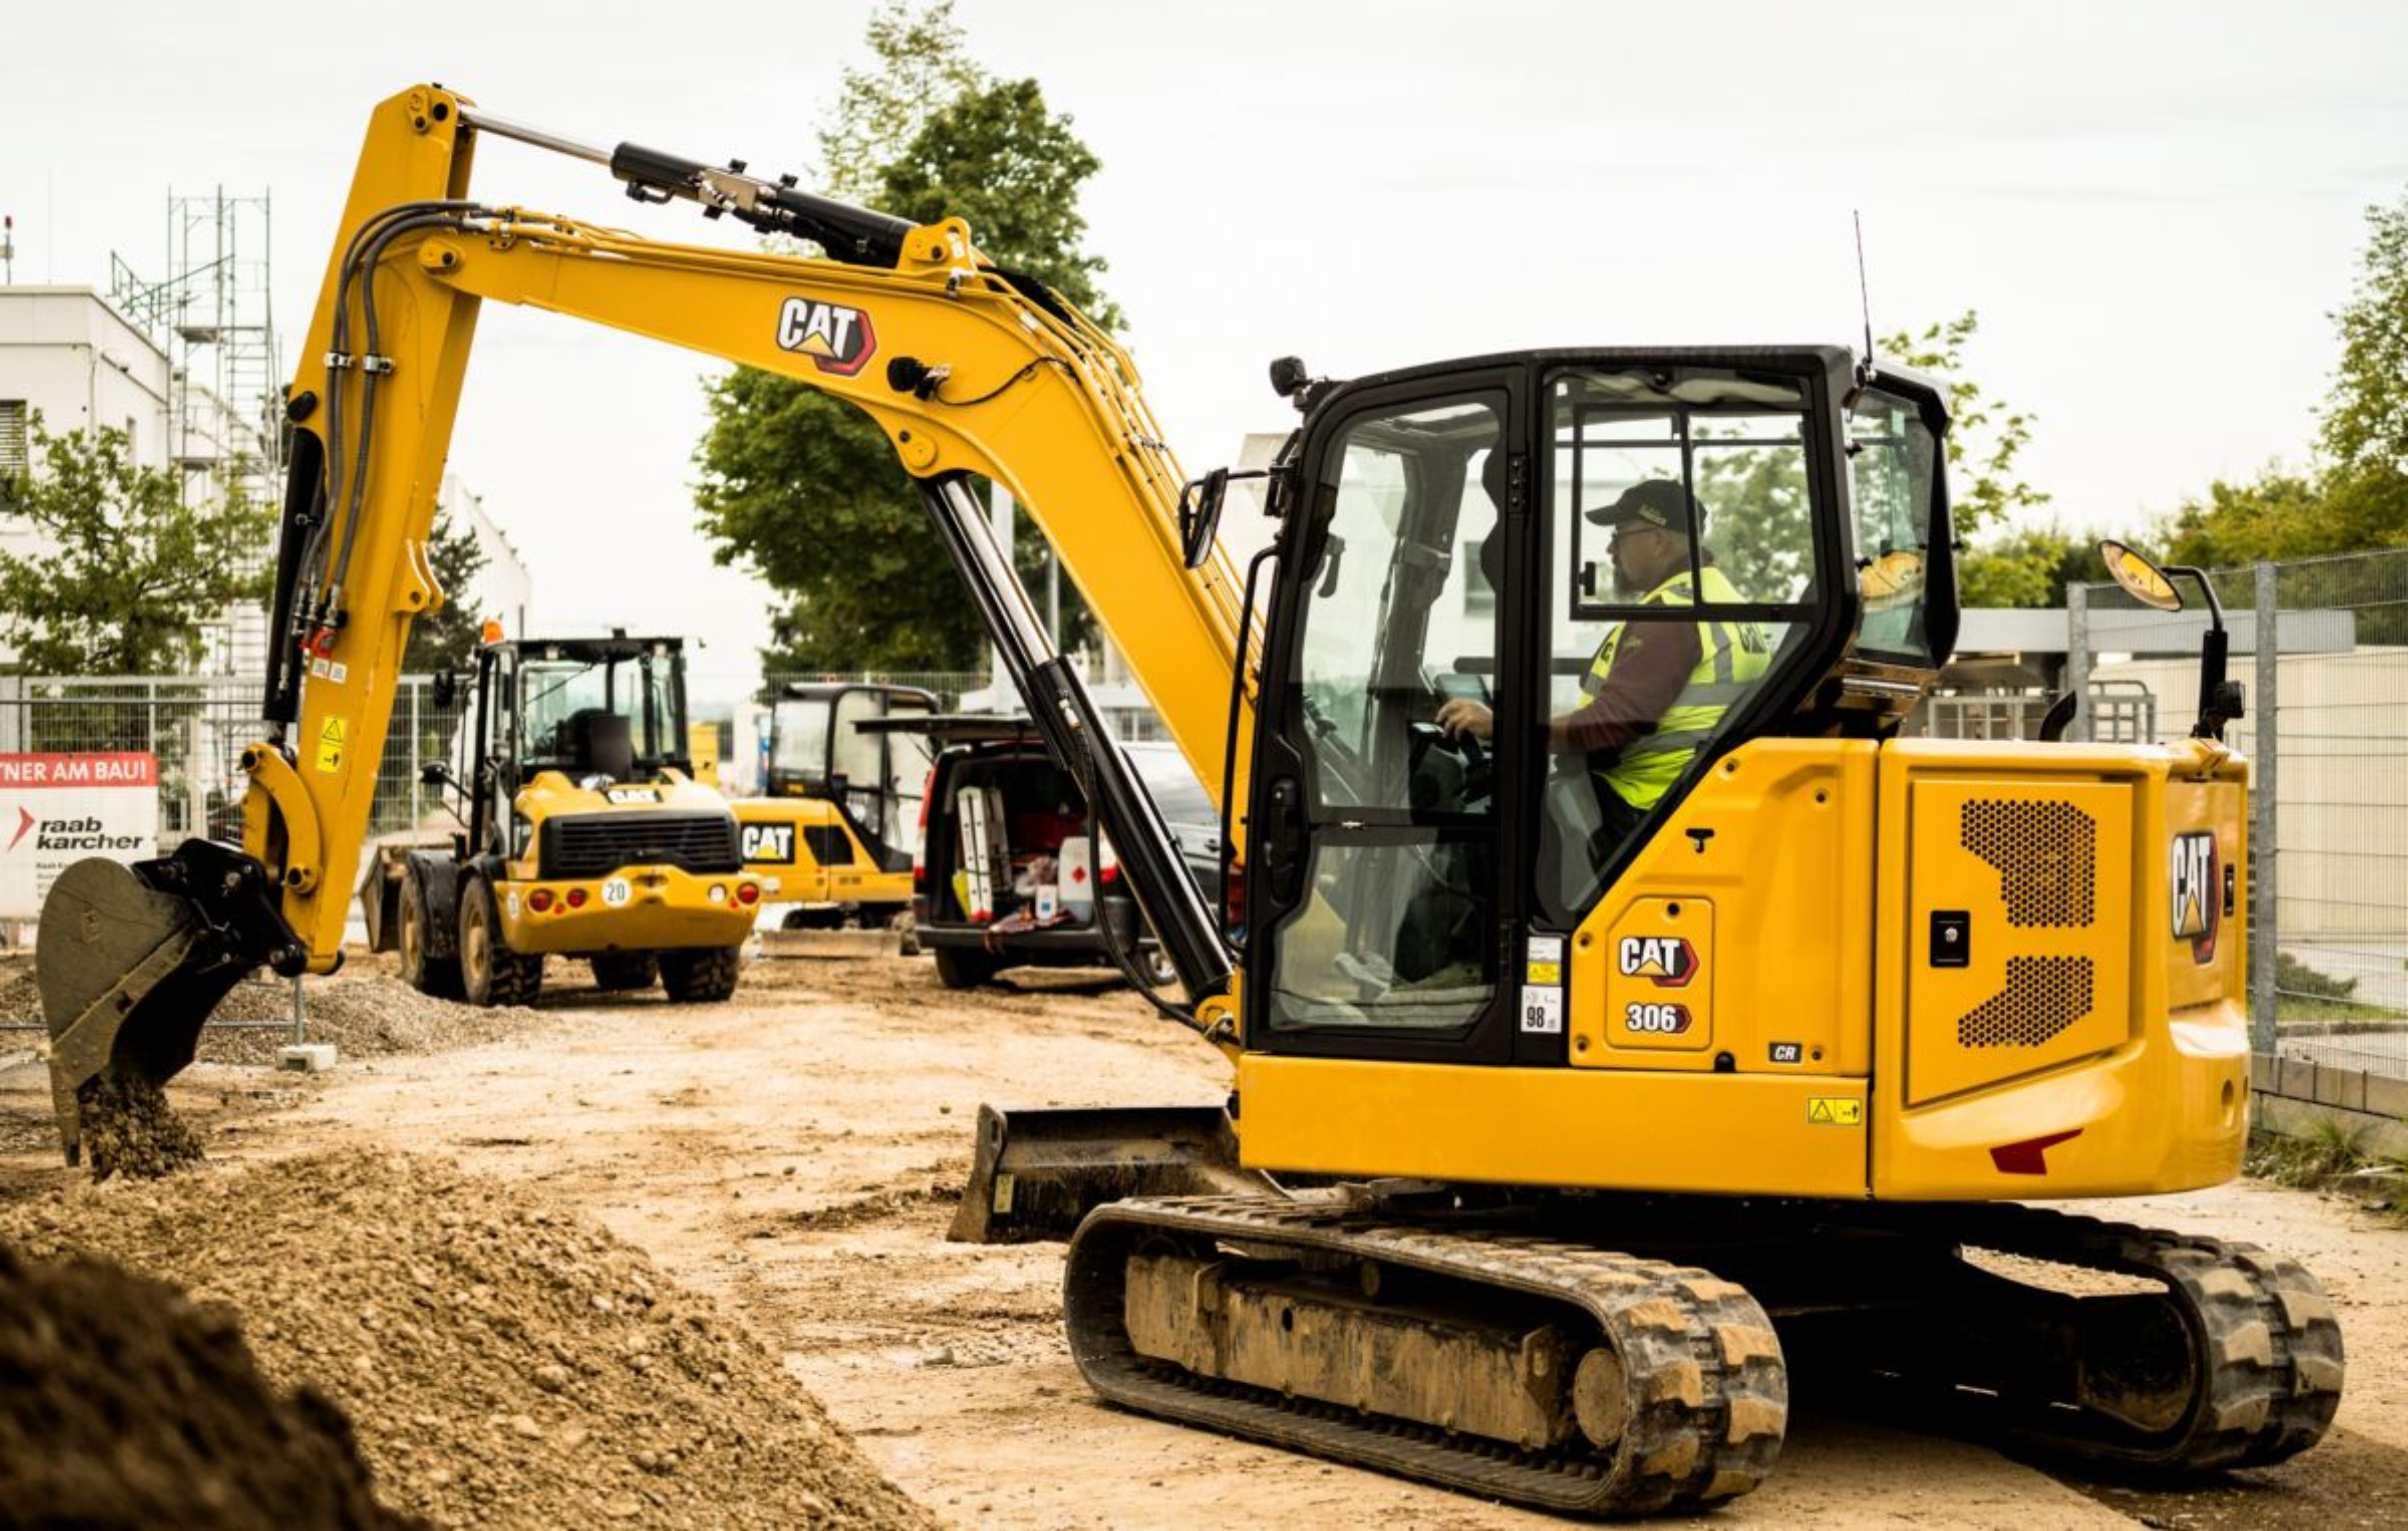 306 CR Next Generation Mini Hydraulic Excavator